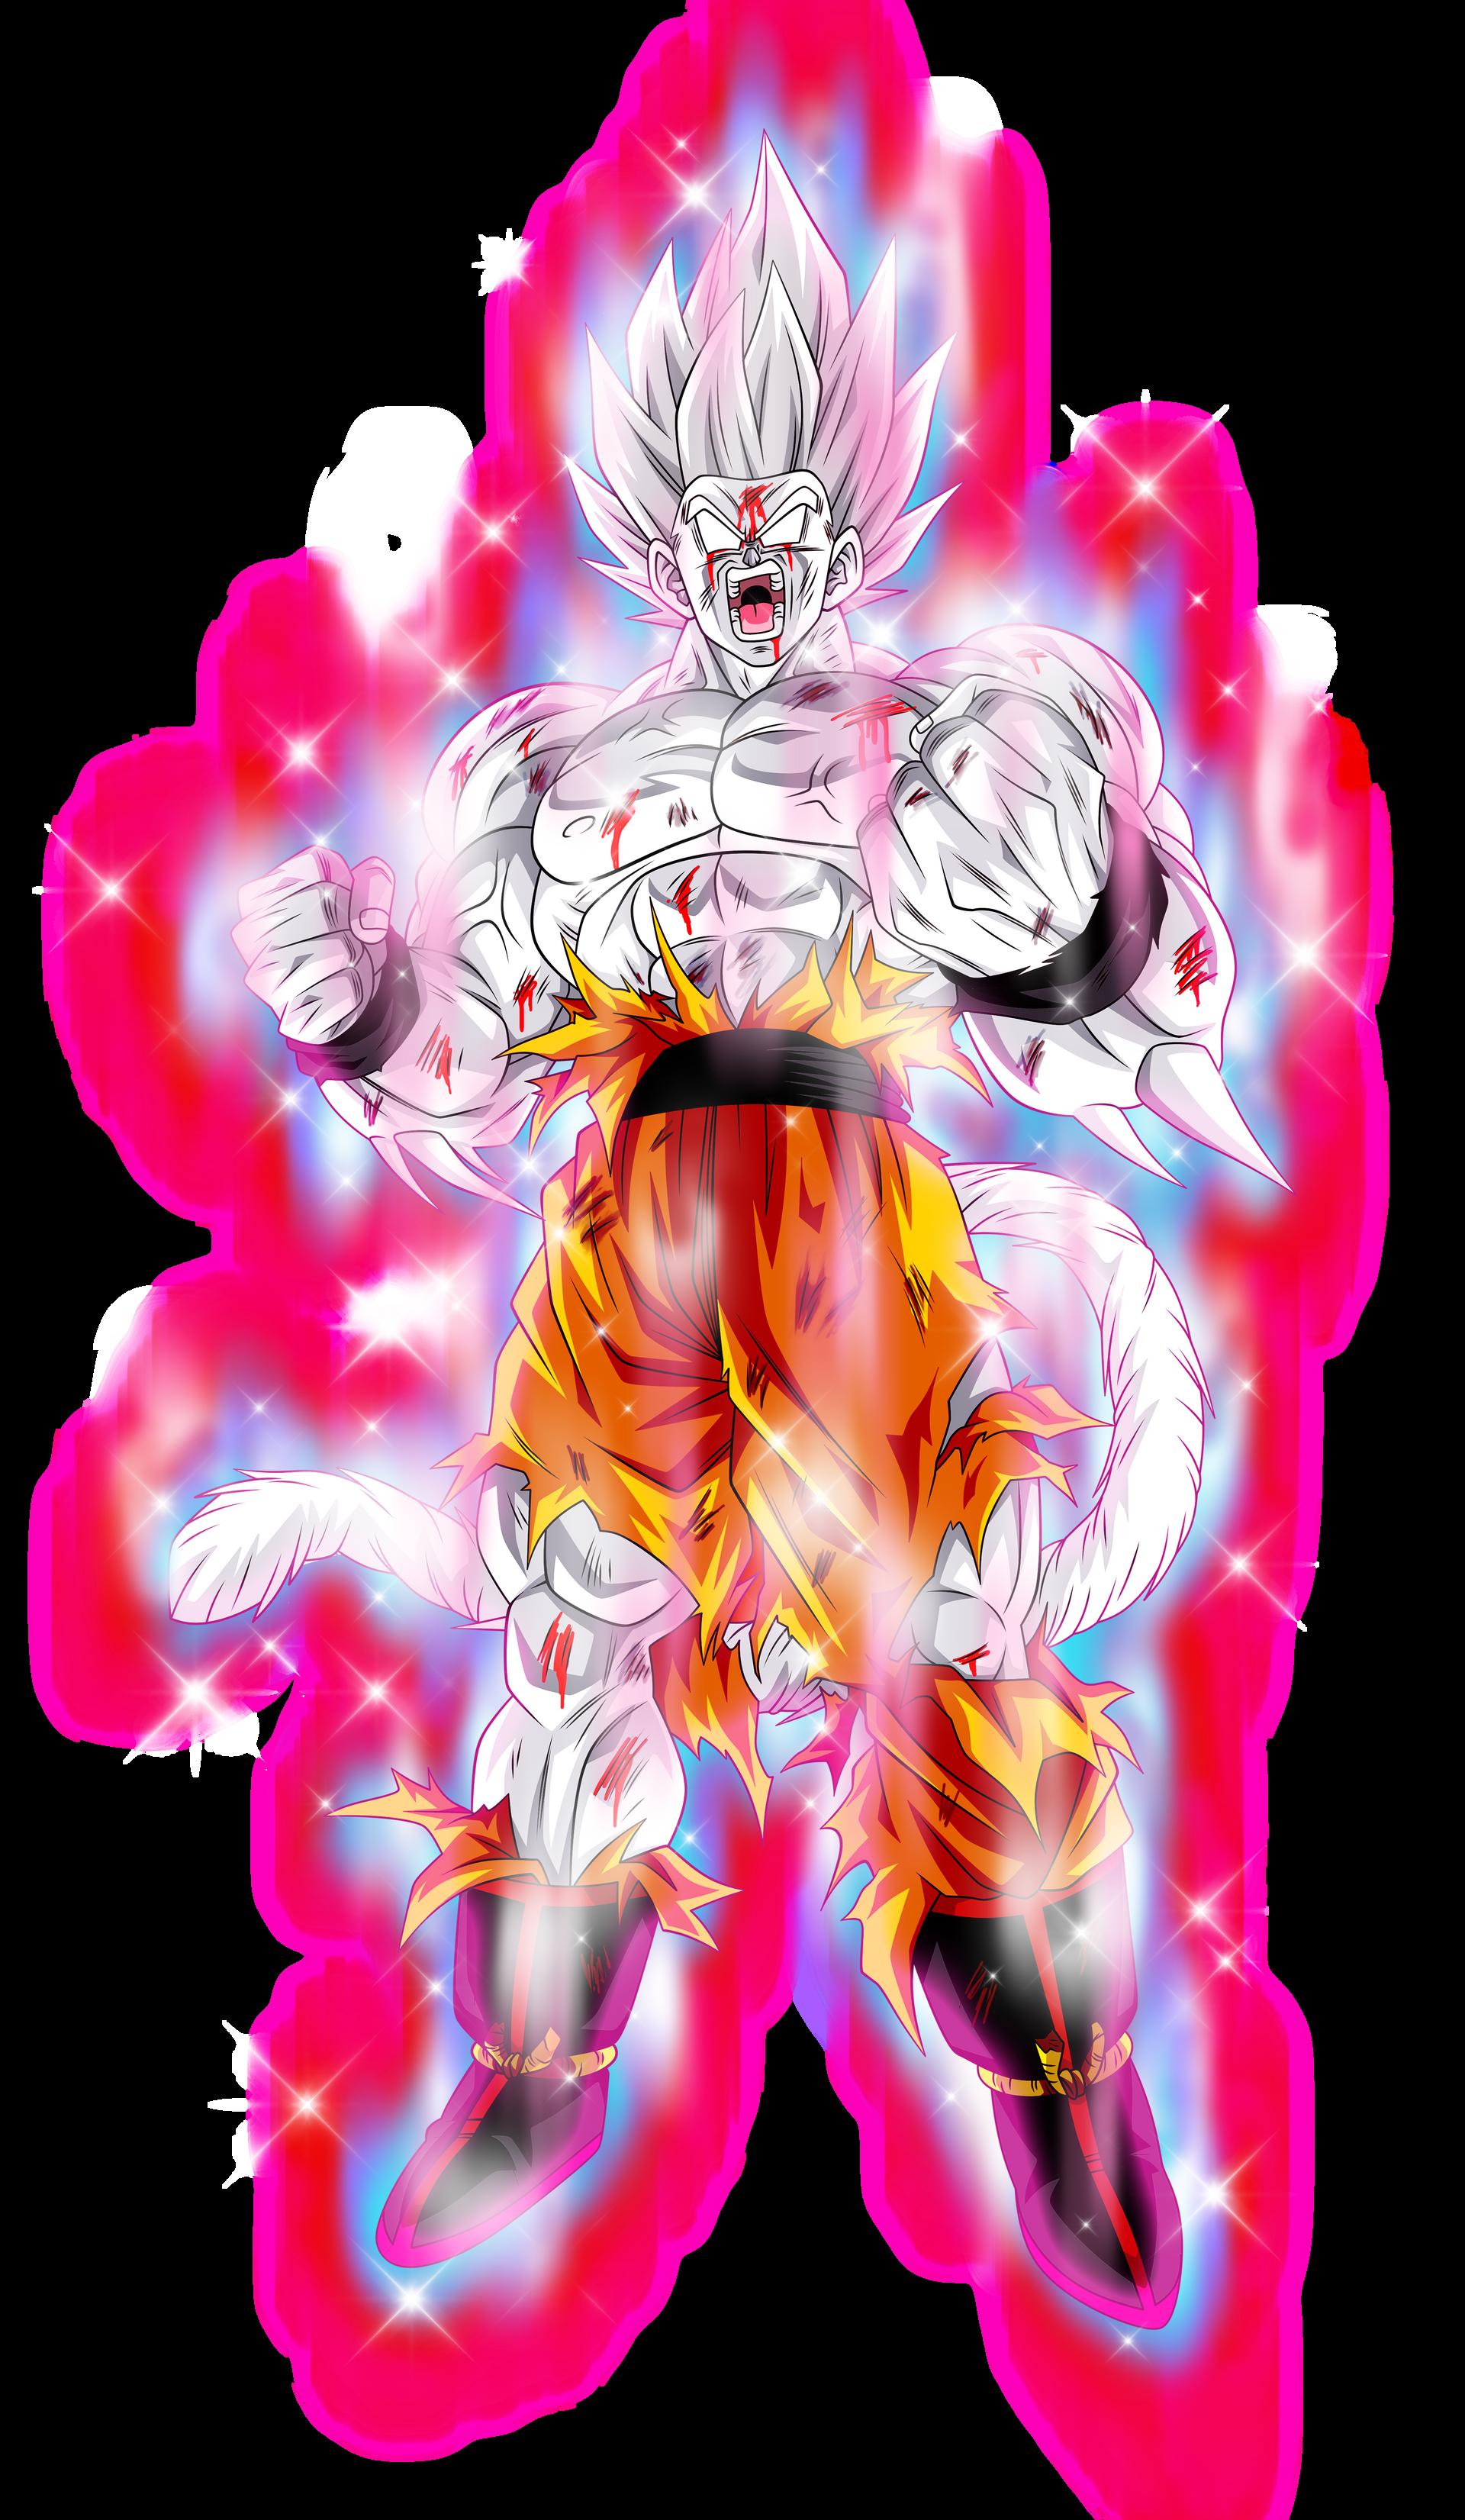 Goku Ssj10 Render 1 Con Aura By Ssjrose890 On Deviantart Dragon Ball Super Artwork Anime Dragon Ball Super Dragon Ball Art